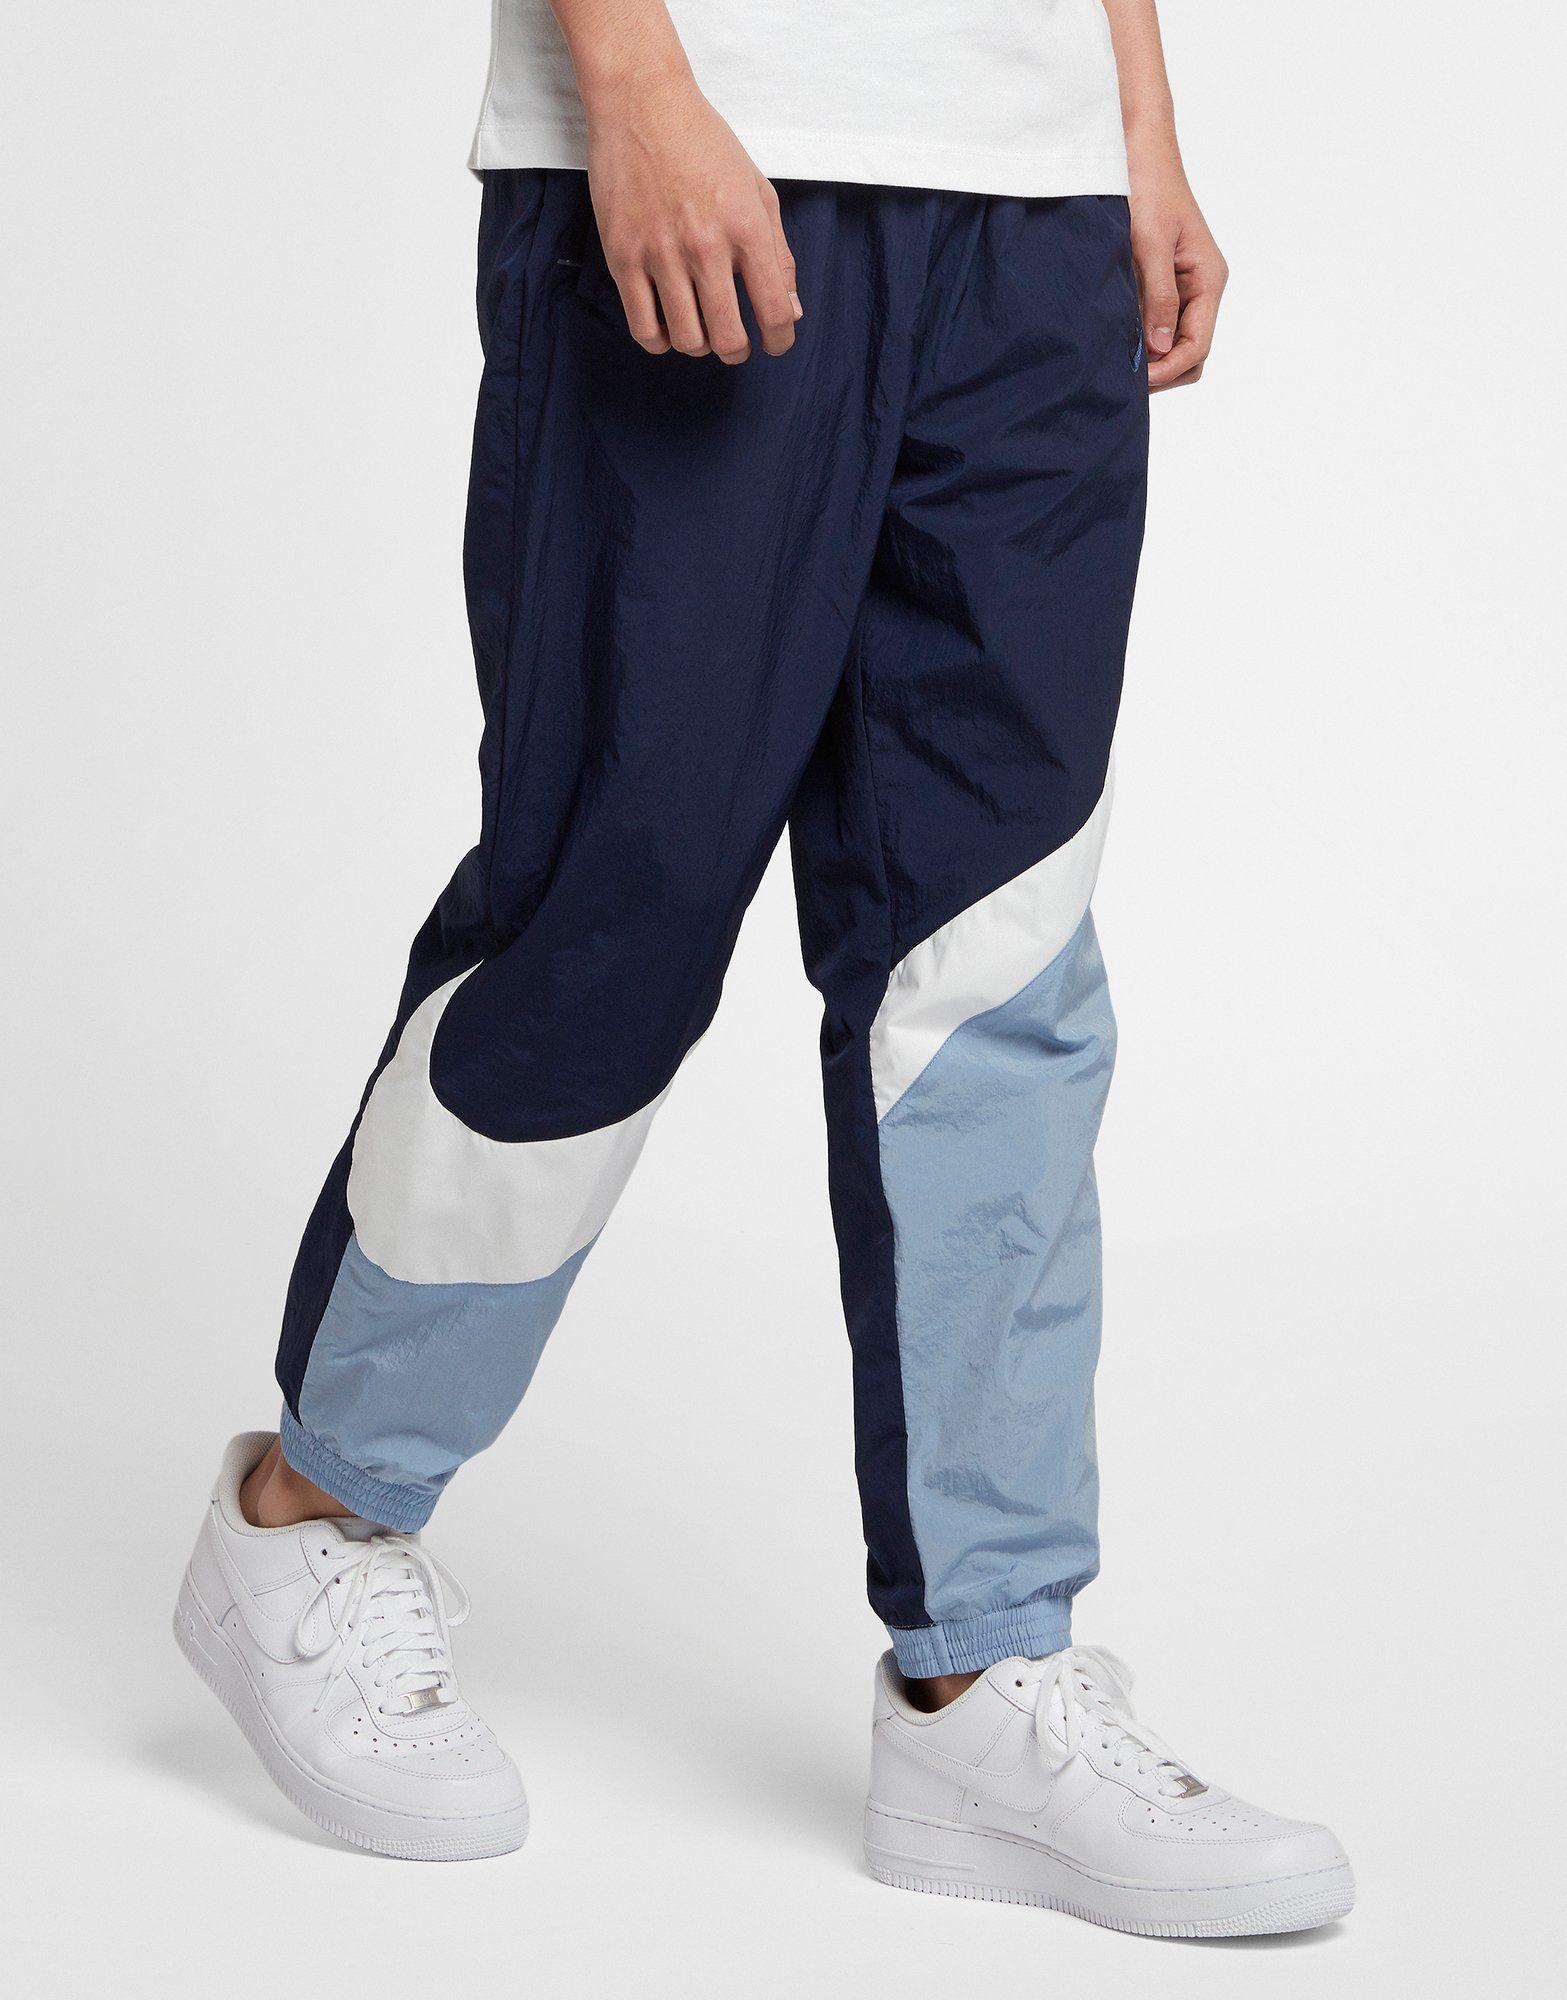 da16360d8252b NIKE Nike Sportswear Woven Trousers | JD Sports